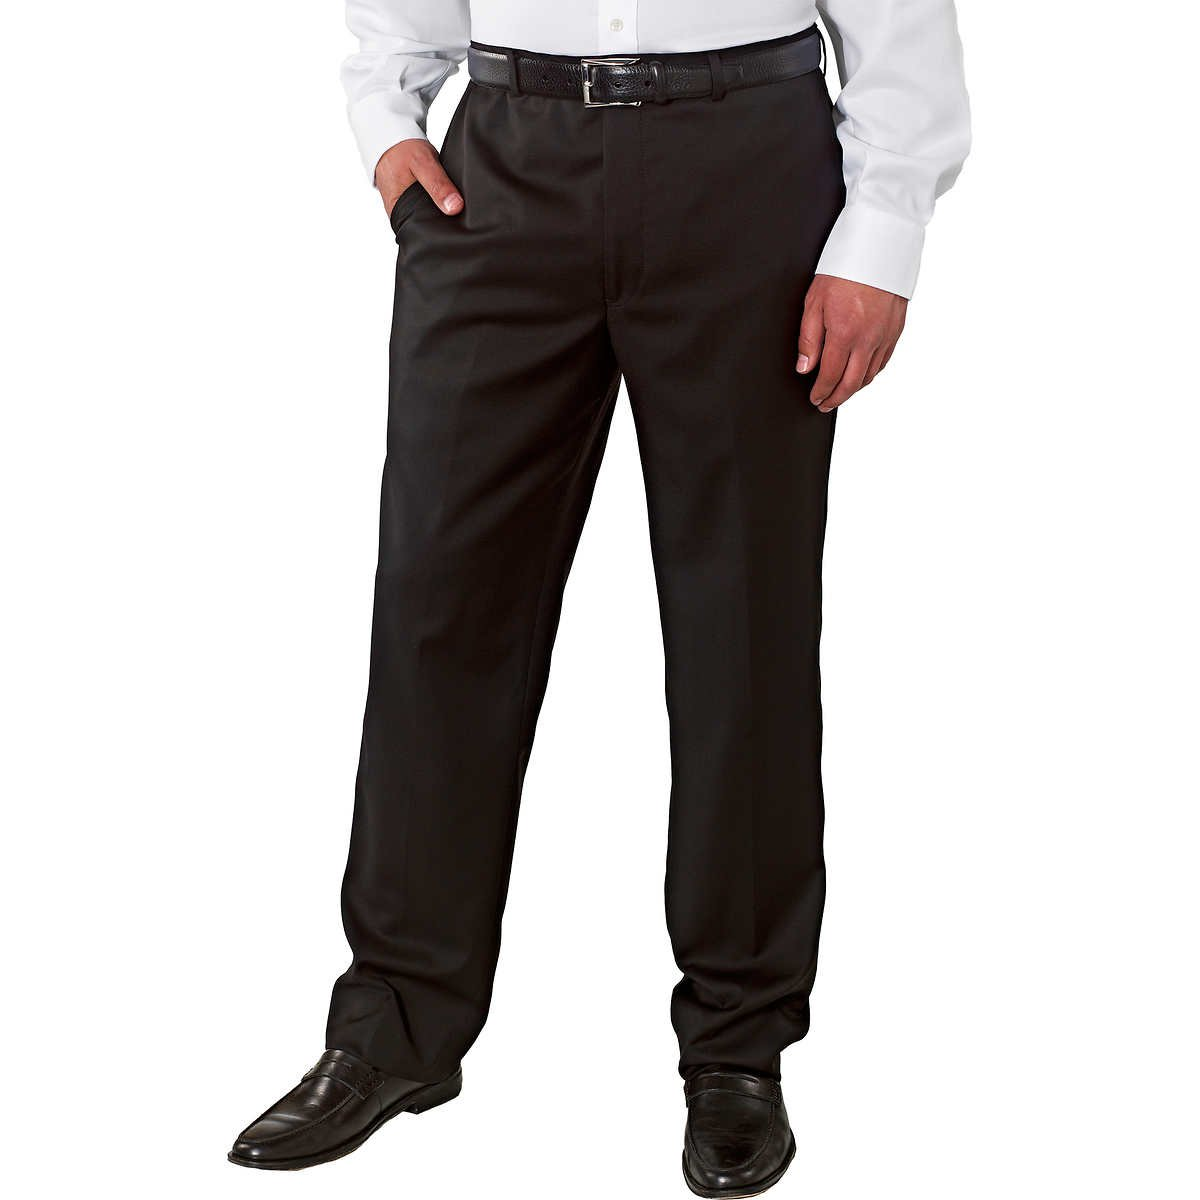 Kirkland Signature Mens Wool Flat Front Dress Pant-Open Bottom Hem (36X32, Black) by Kirkland Signature. (Image #1)